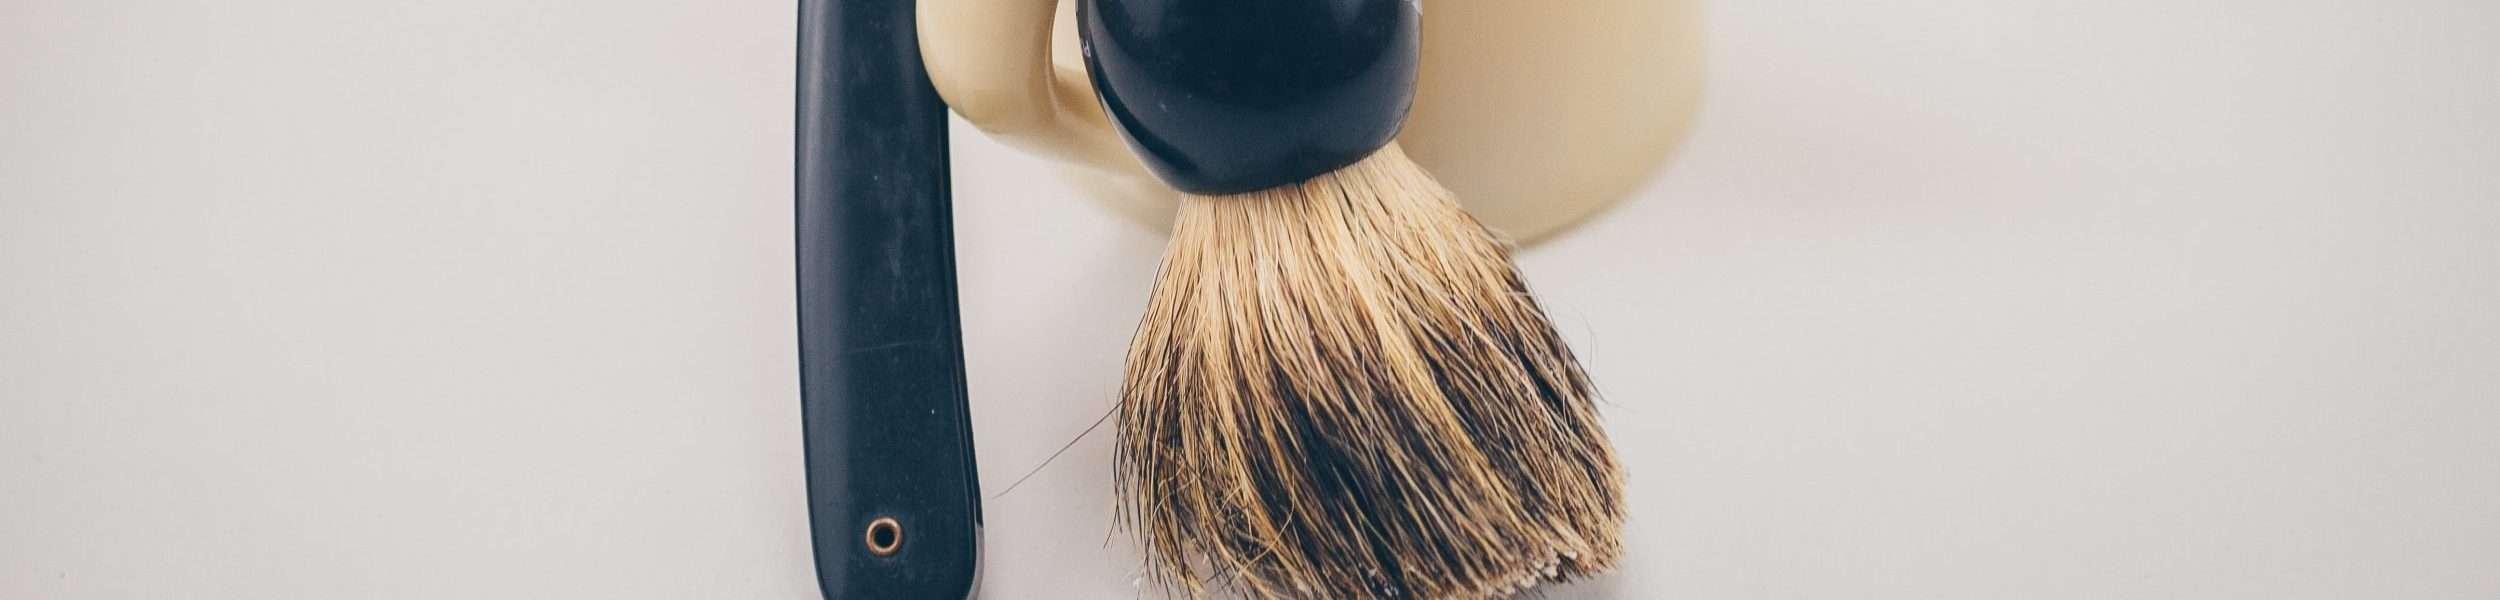 Drying a shaving brush